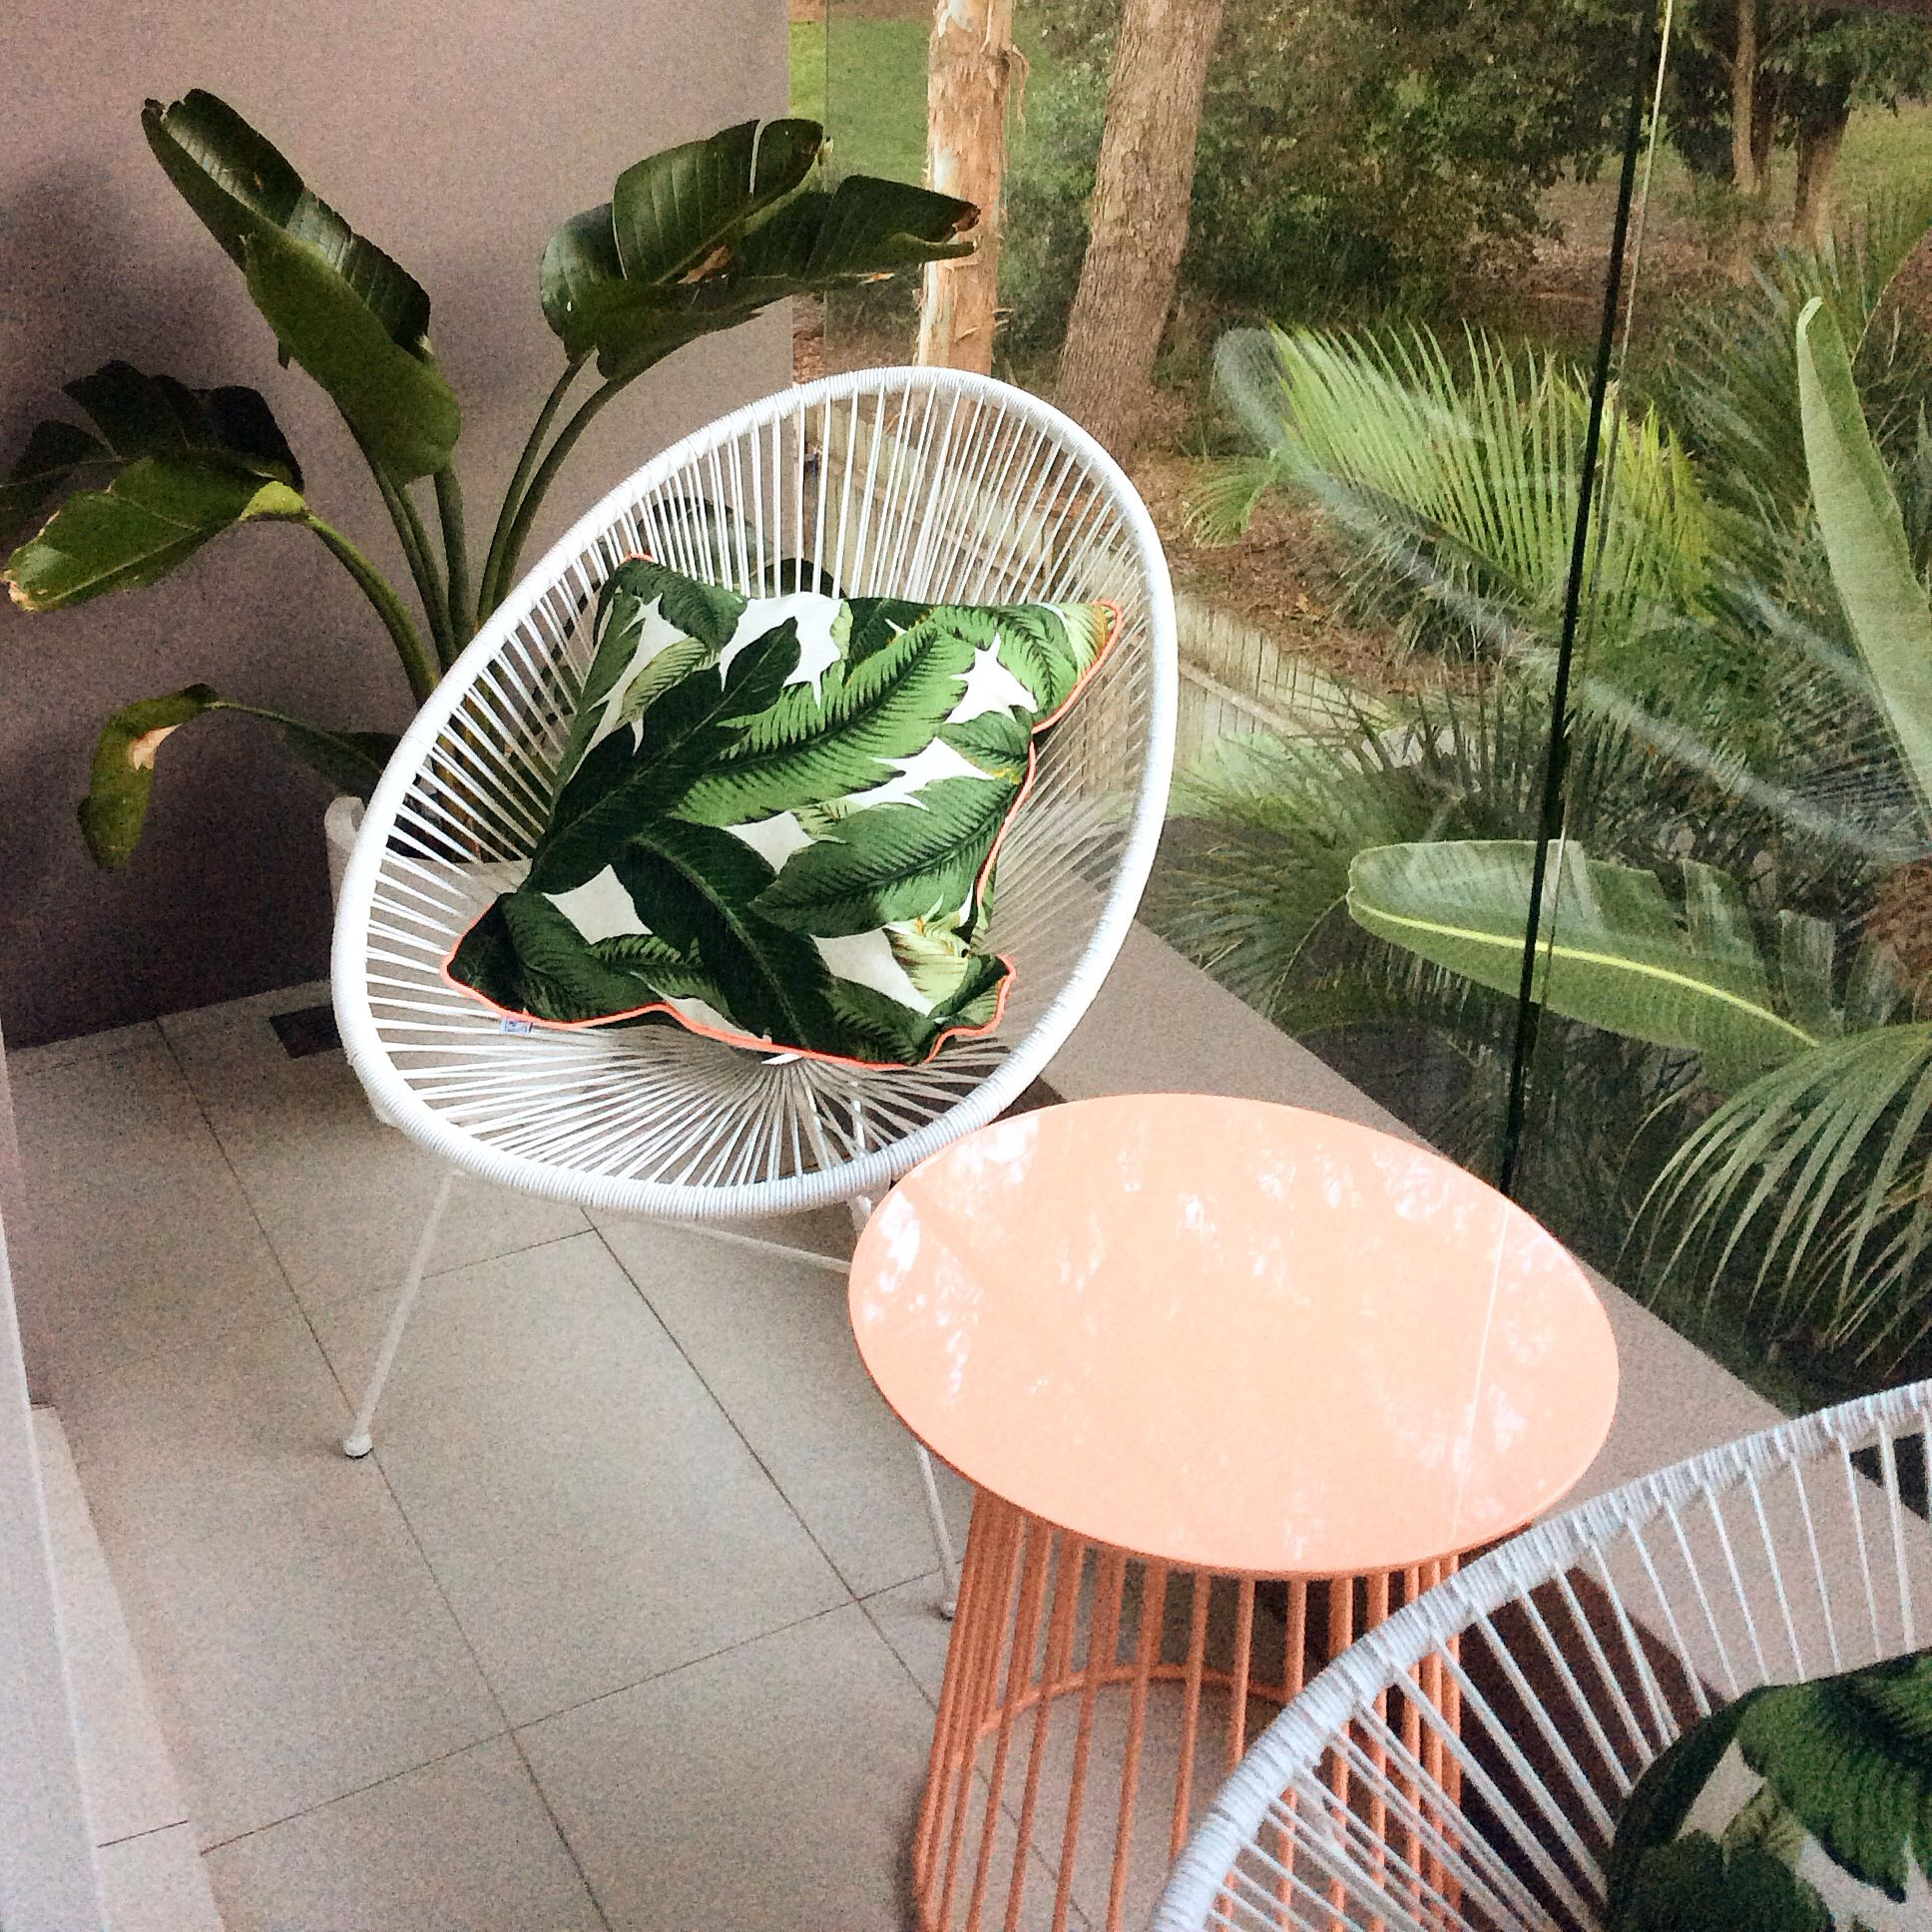 Outdoor Design For Small Balcony Urban Design Small